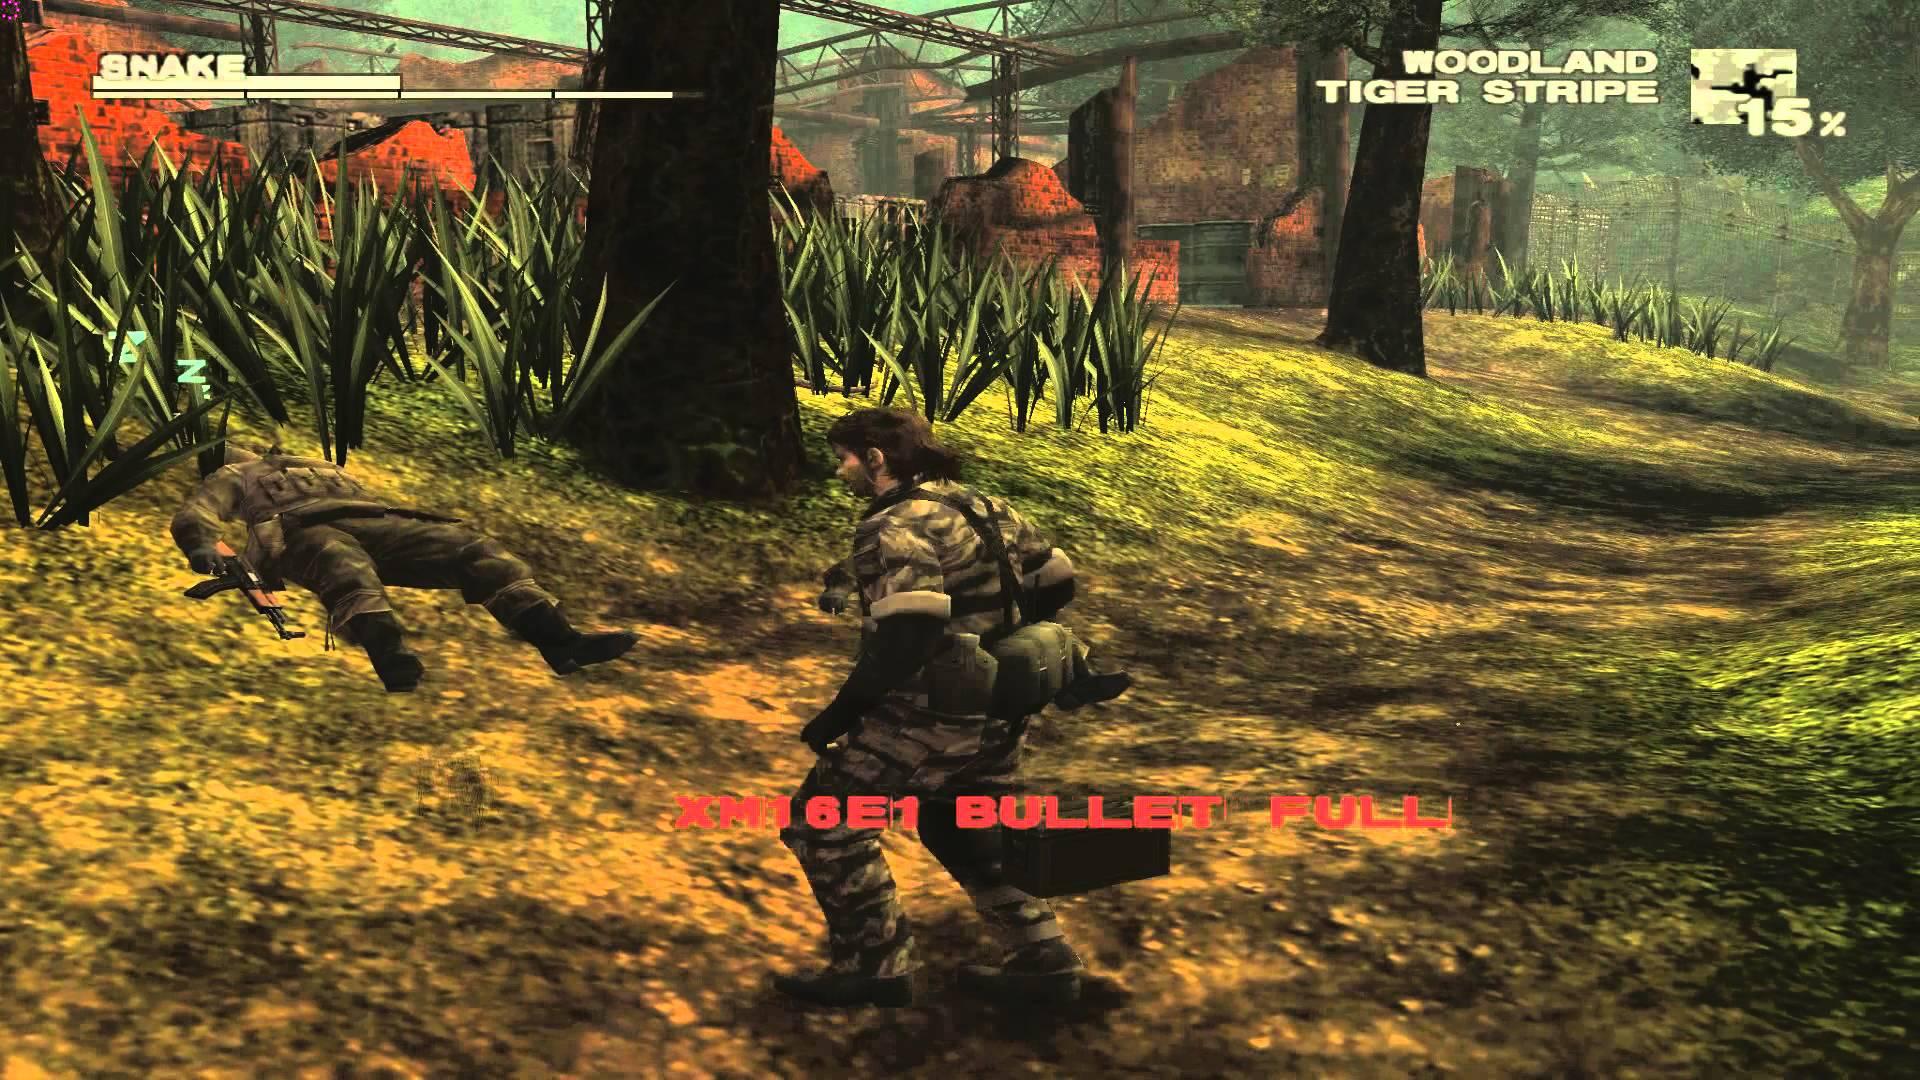 Metal Gear Solid 3 Snake Eater Wallpapers Video Game Hq Metal